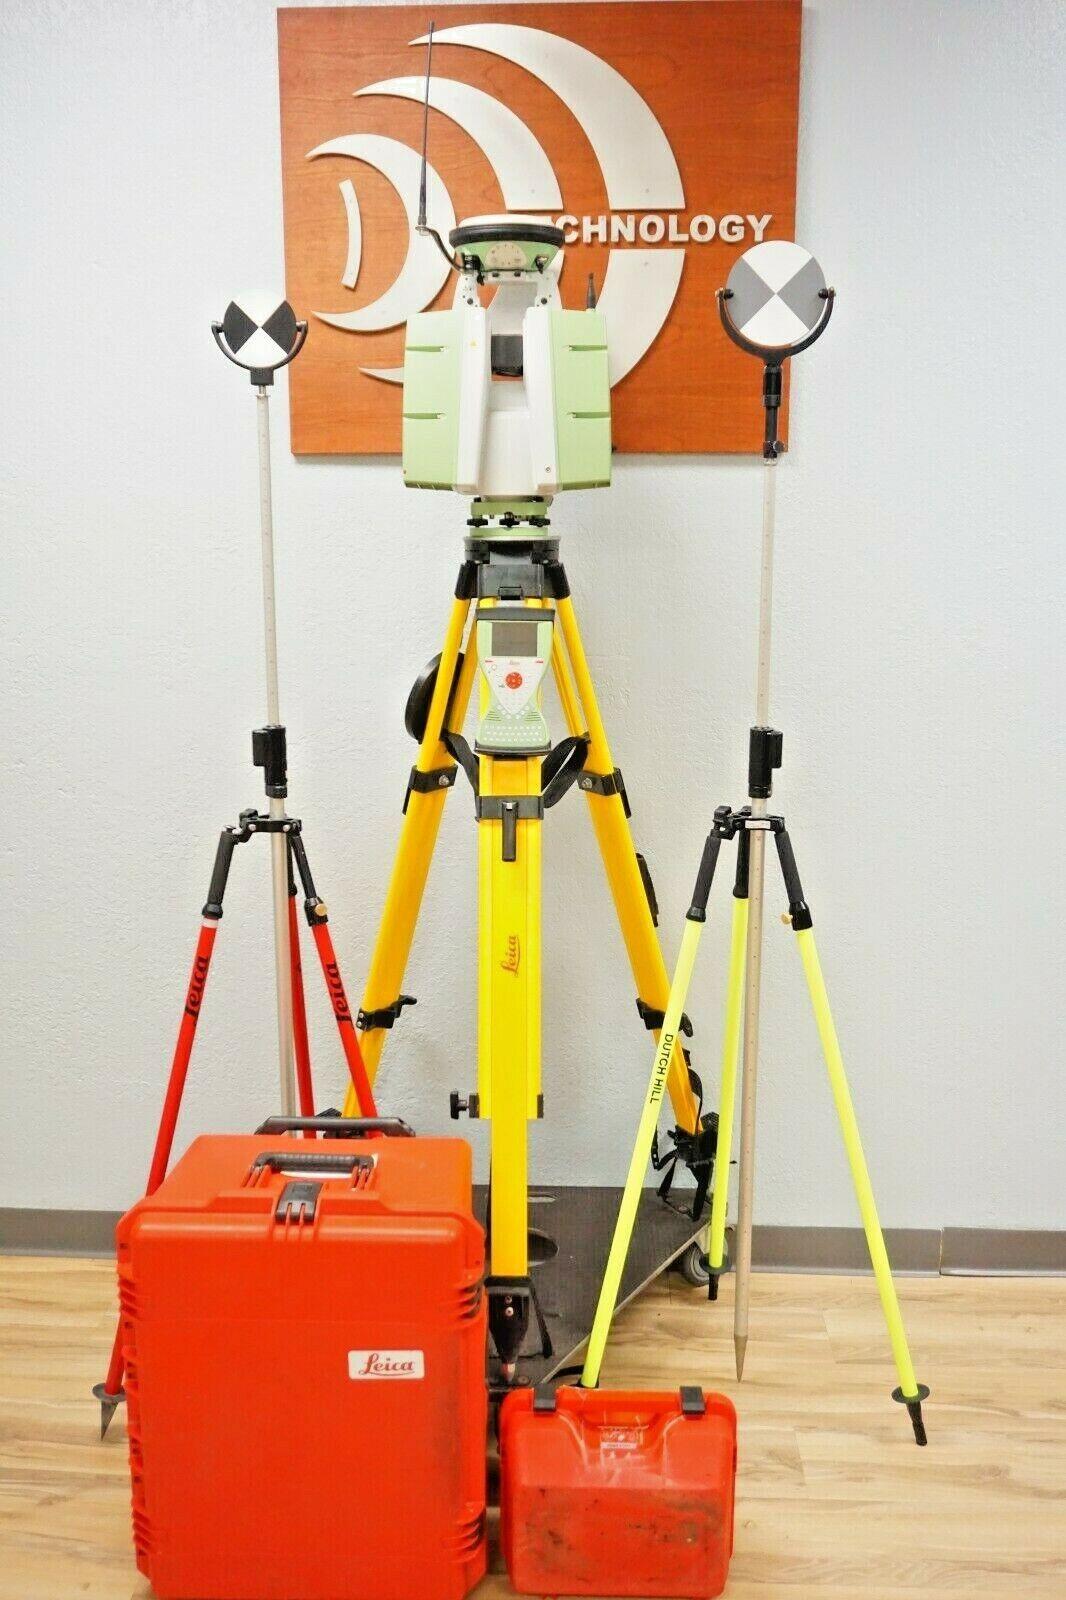 Leica P20 3D High Accuracy Long Range Laser Scanner GS14 CS15 GNSS C10 P30 Faro